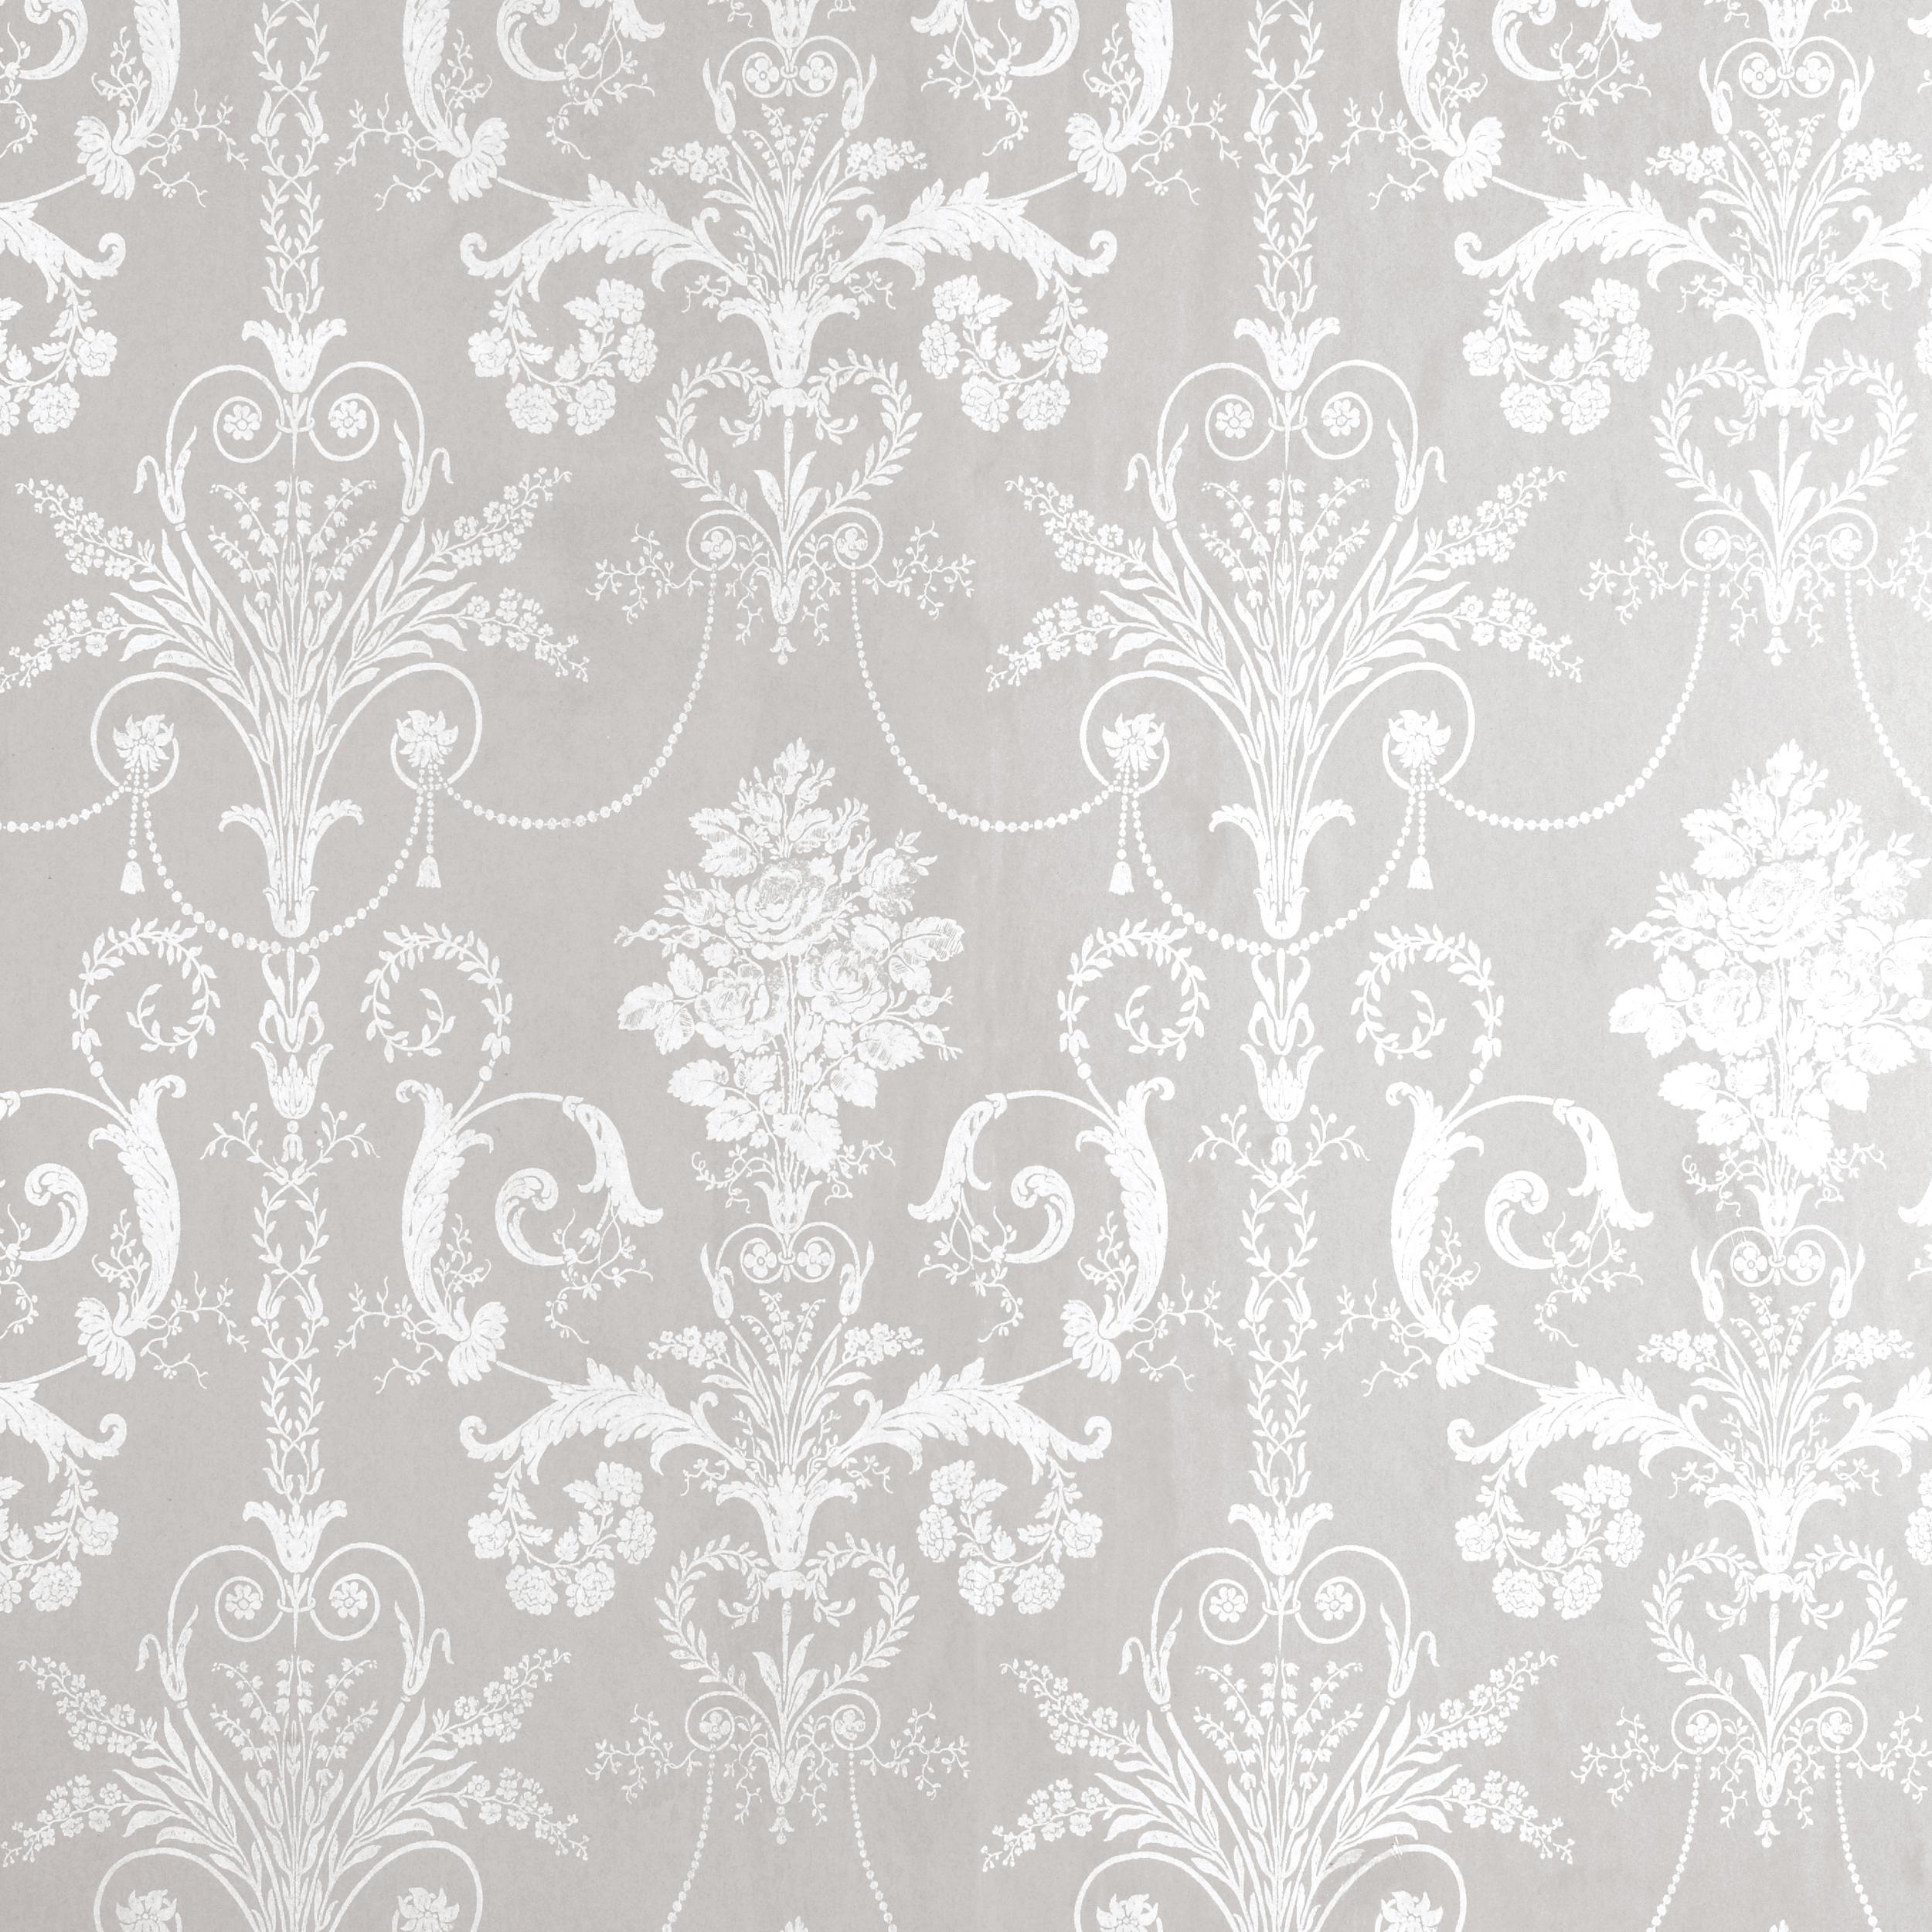 Home Decorating Wallpaper Josette WhiteDove Grey Damask Wallpaper 2500x2500